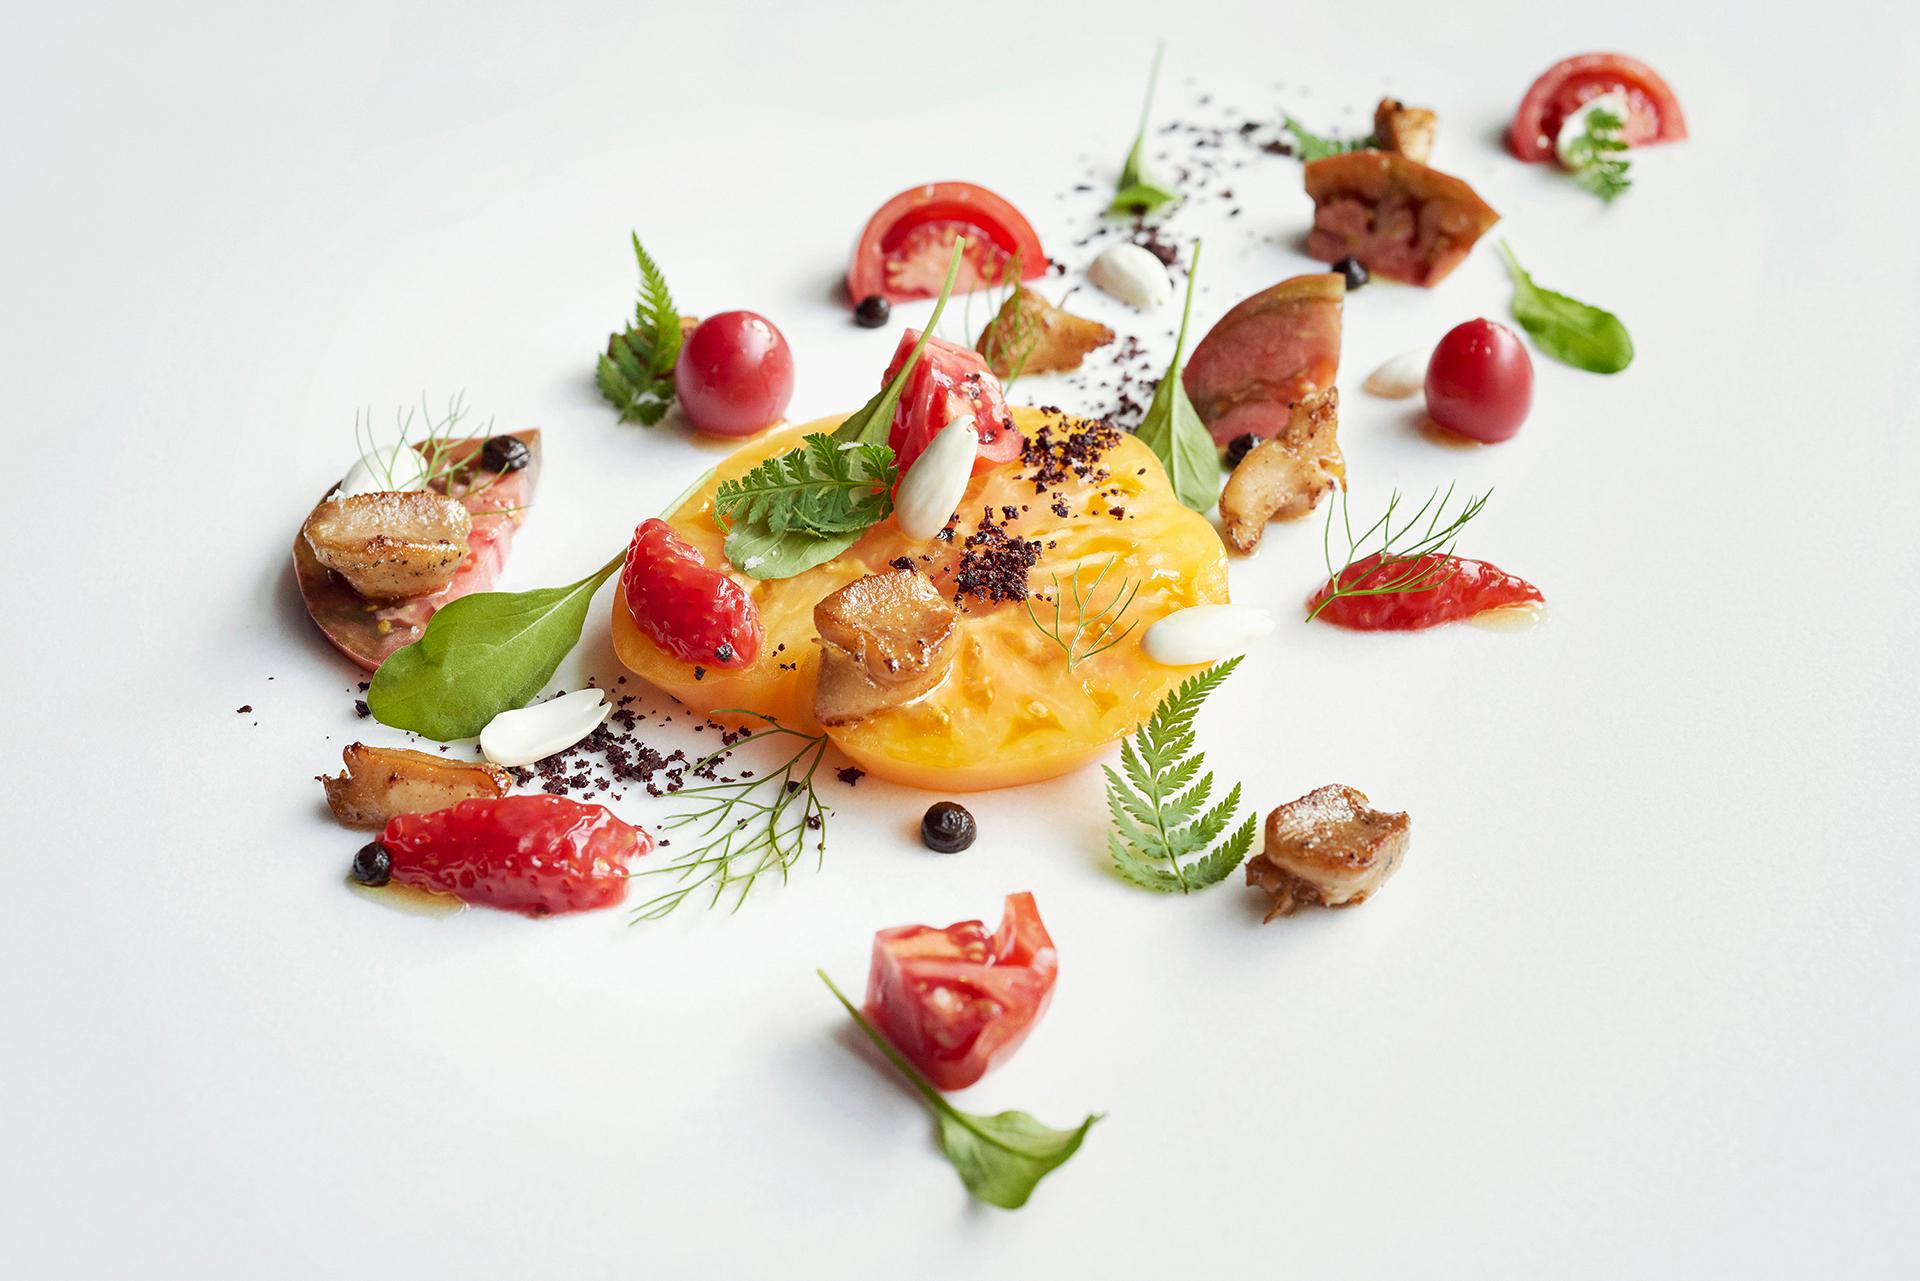 Michelin star-caliber restaurants in Montreal